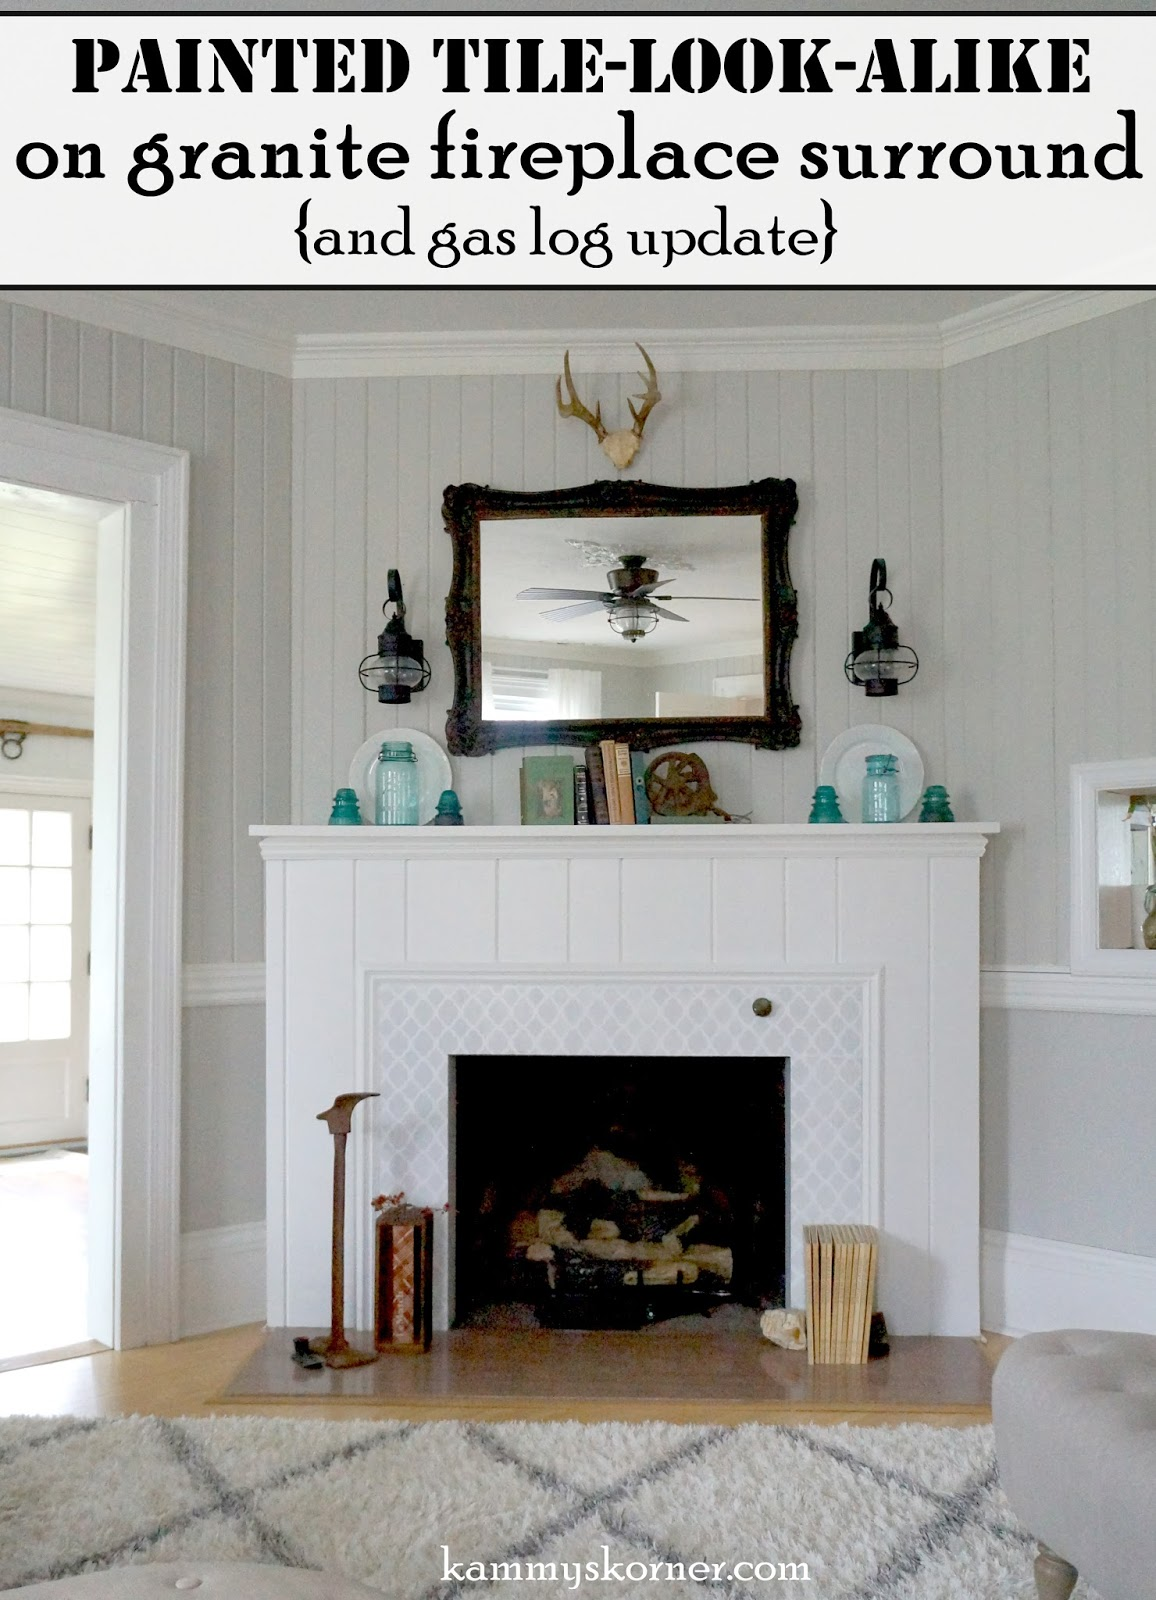 stenciled granite fireplace surround update